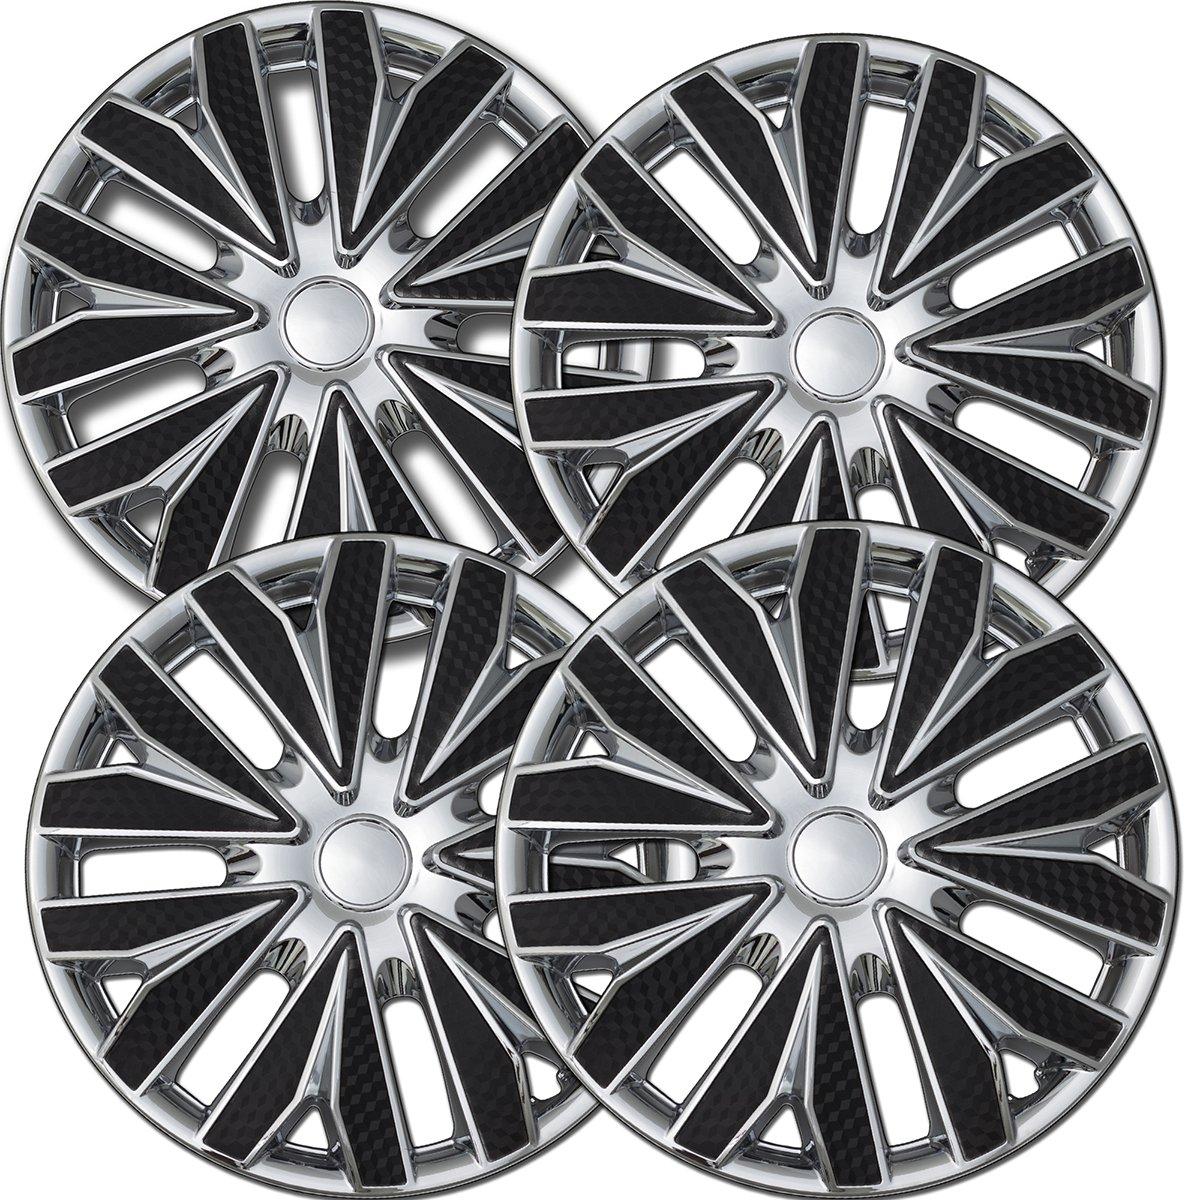 OxGord Hub-caps for 12-17 Nissan Versa Wheel Covers 15 inch Snap On Chrome Ice Black